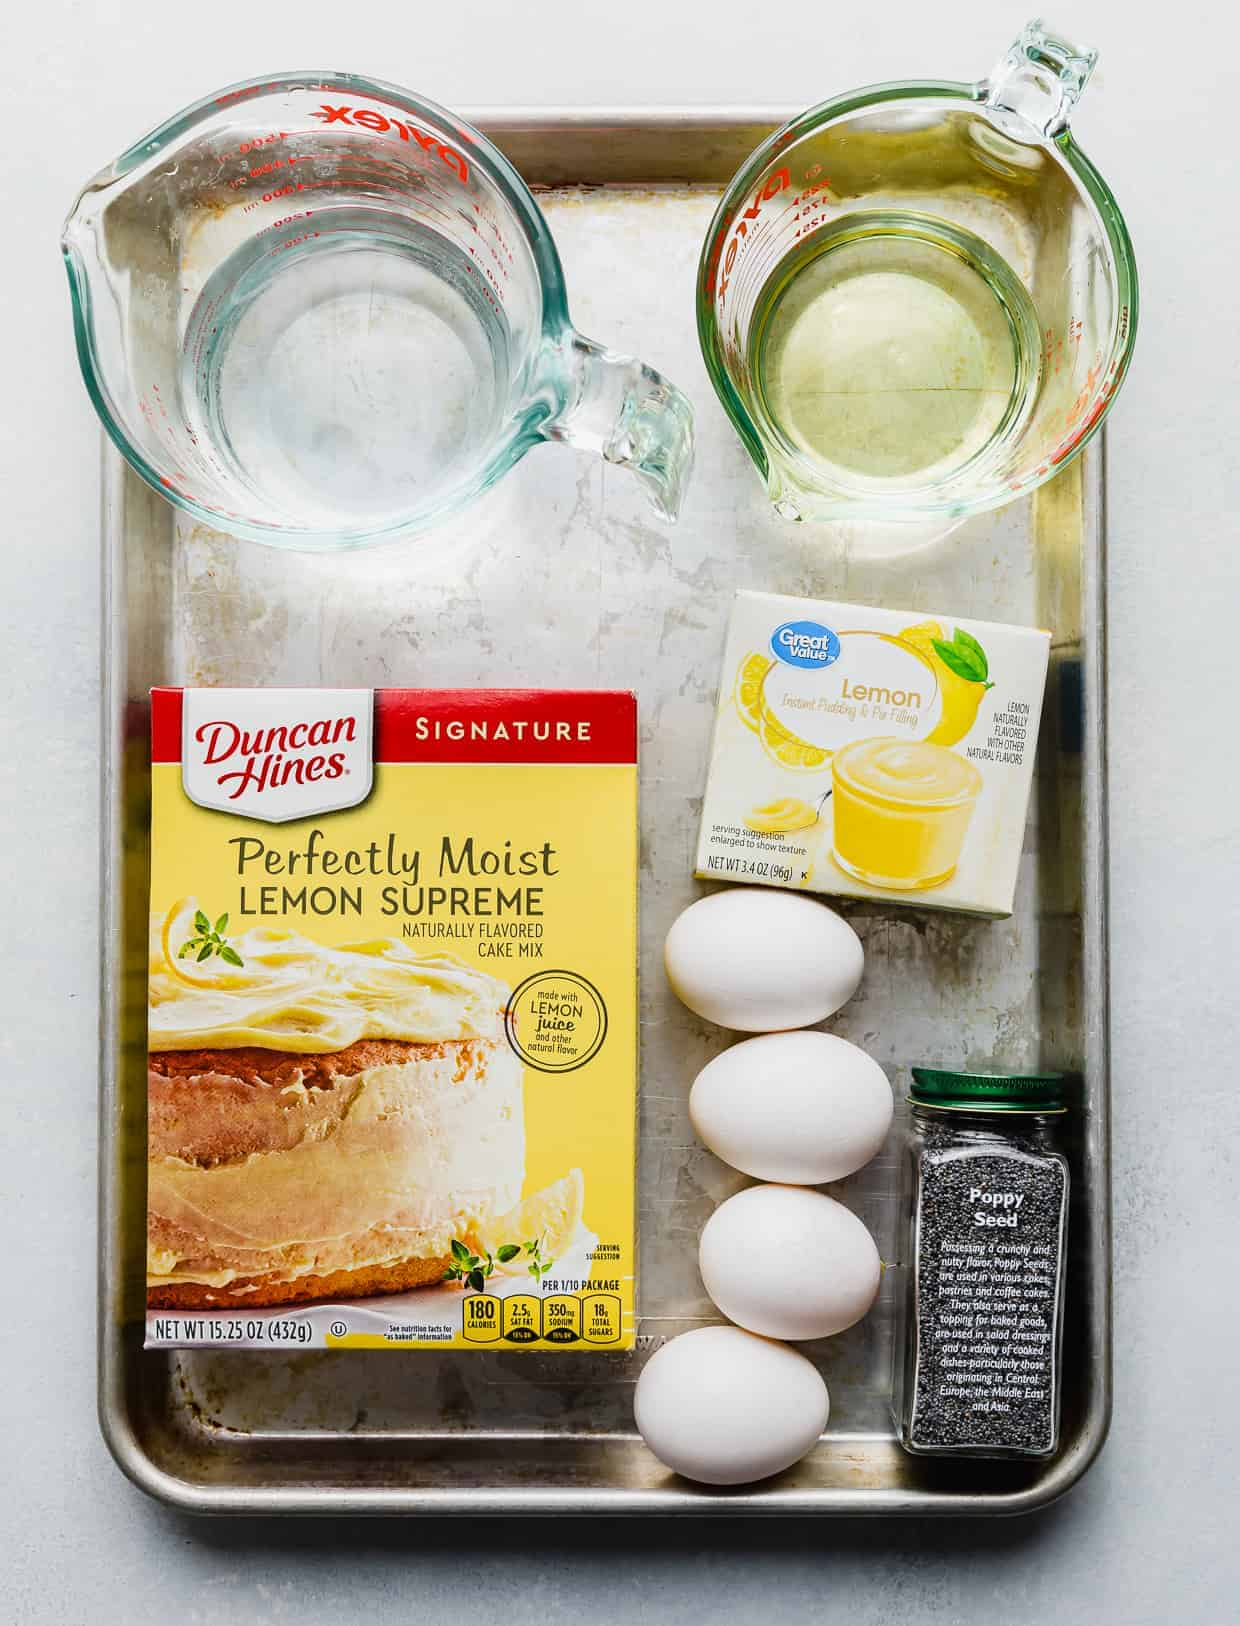 Ingredients used to make lemon bread on a baking sheet: lemon cake mix, water, oil, eggs, lemon pudding mix, and poppy seeds.